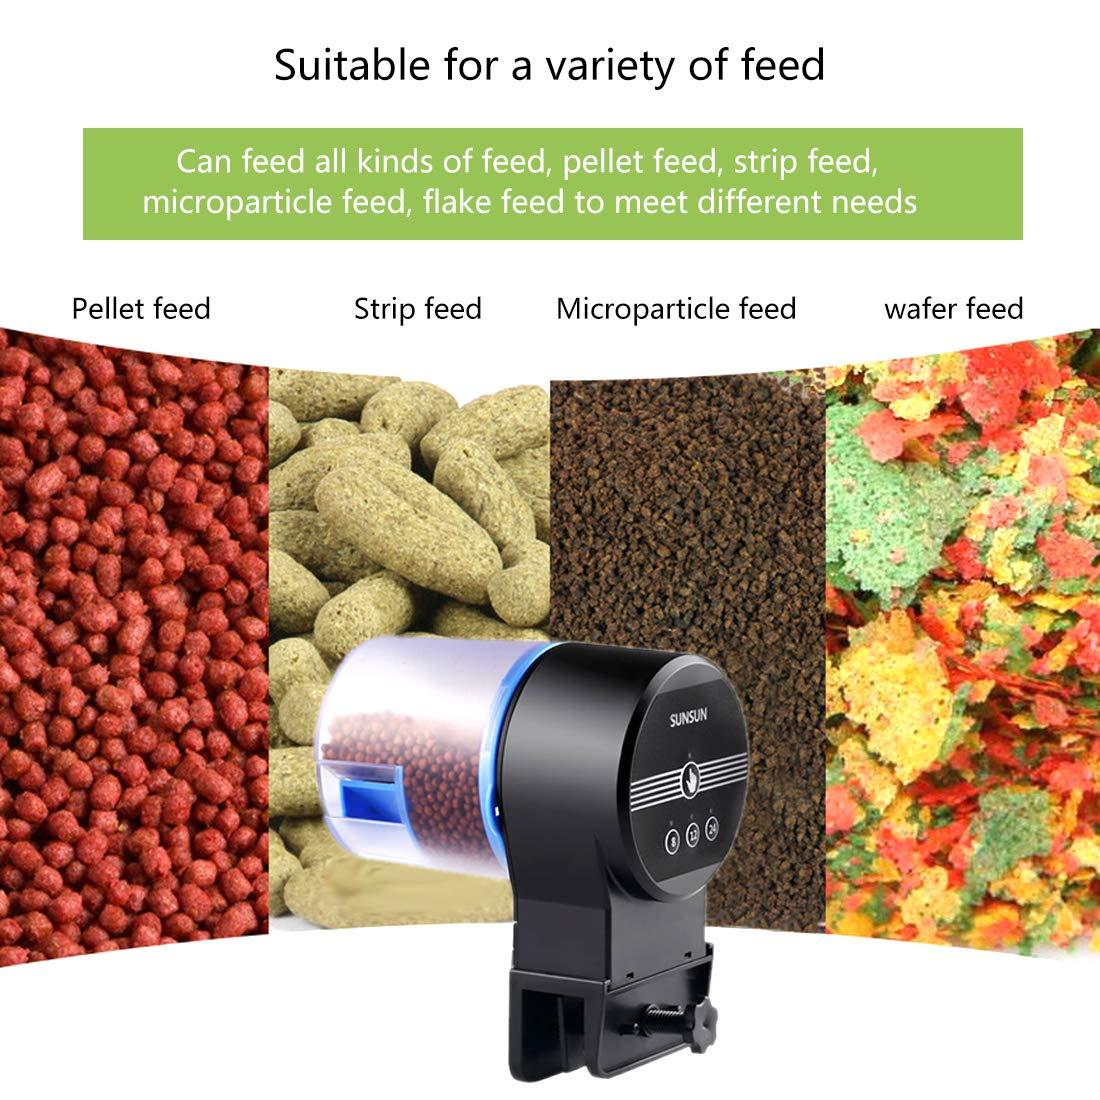 Iseebiz Automatic Tank Feeder Koi Goldfish Feeder Aquariums Moisture-Proof Intelligent Timing Feeding Machine, 2 Fish Food Dispenser. by Iseebiz (Image #4)